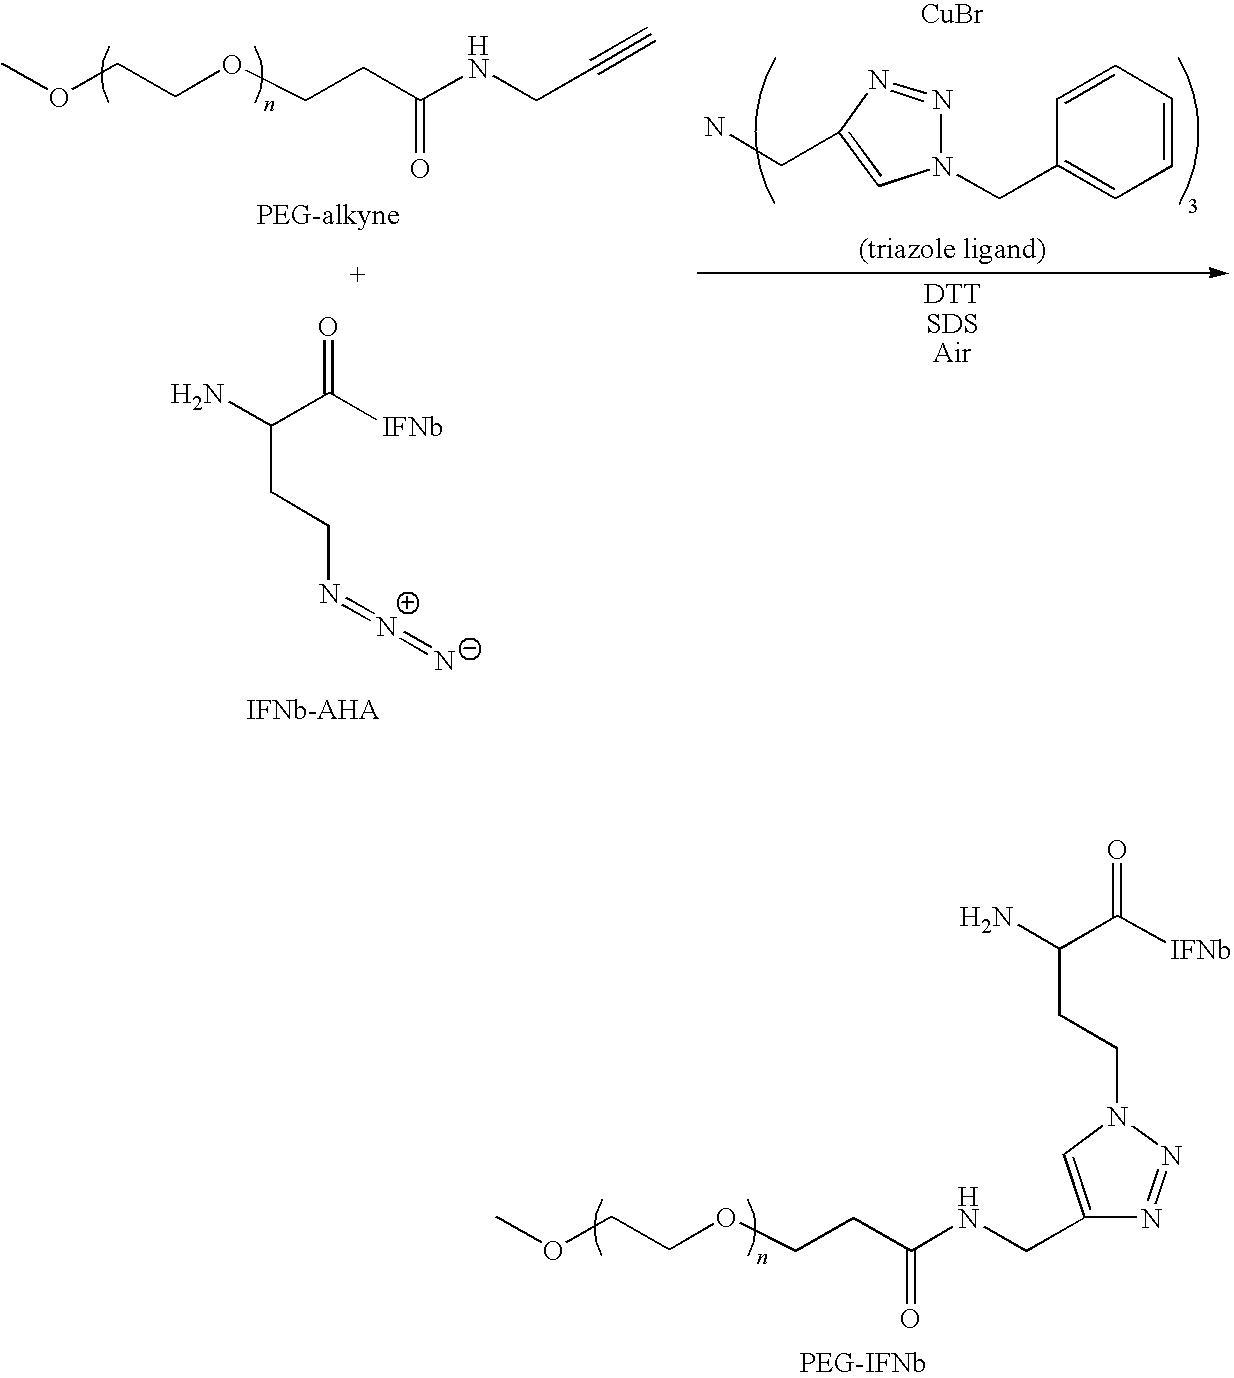 Us7829659b2 Methods Of Modifying Polypeptides Comprising Non 2000 Mg Zs Under Dash Fuse Box Diagram Natural Amino Acids Google Patents